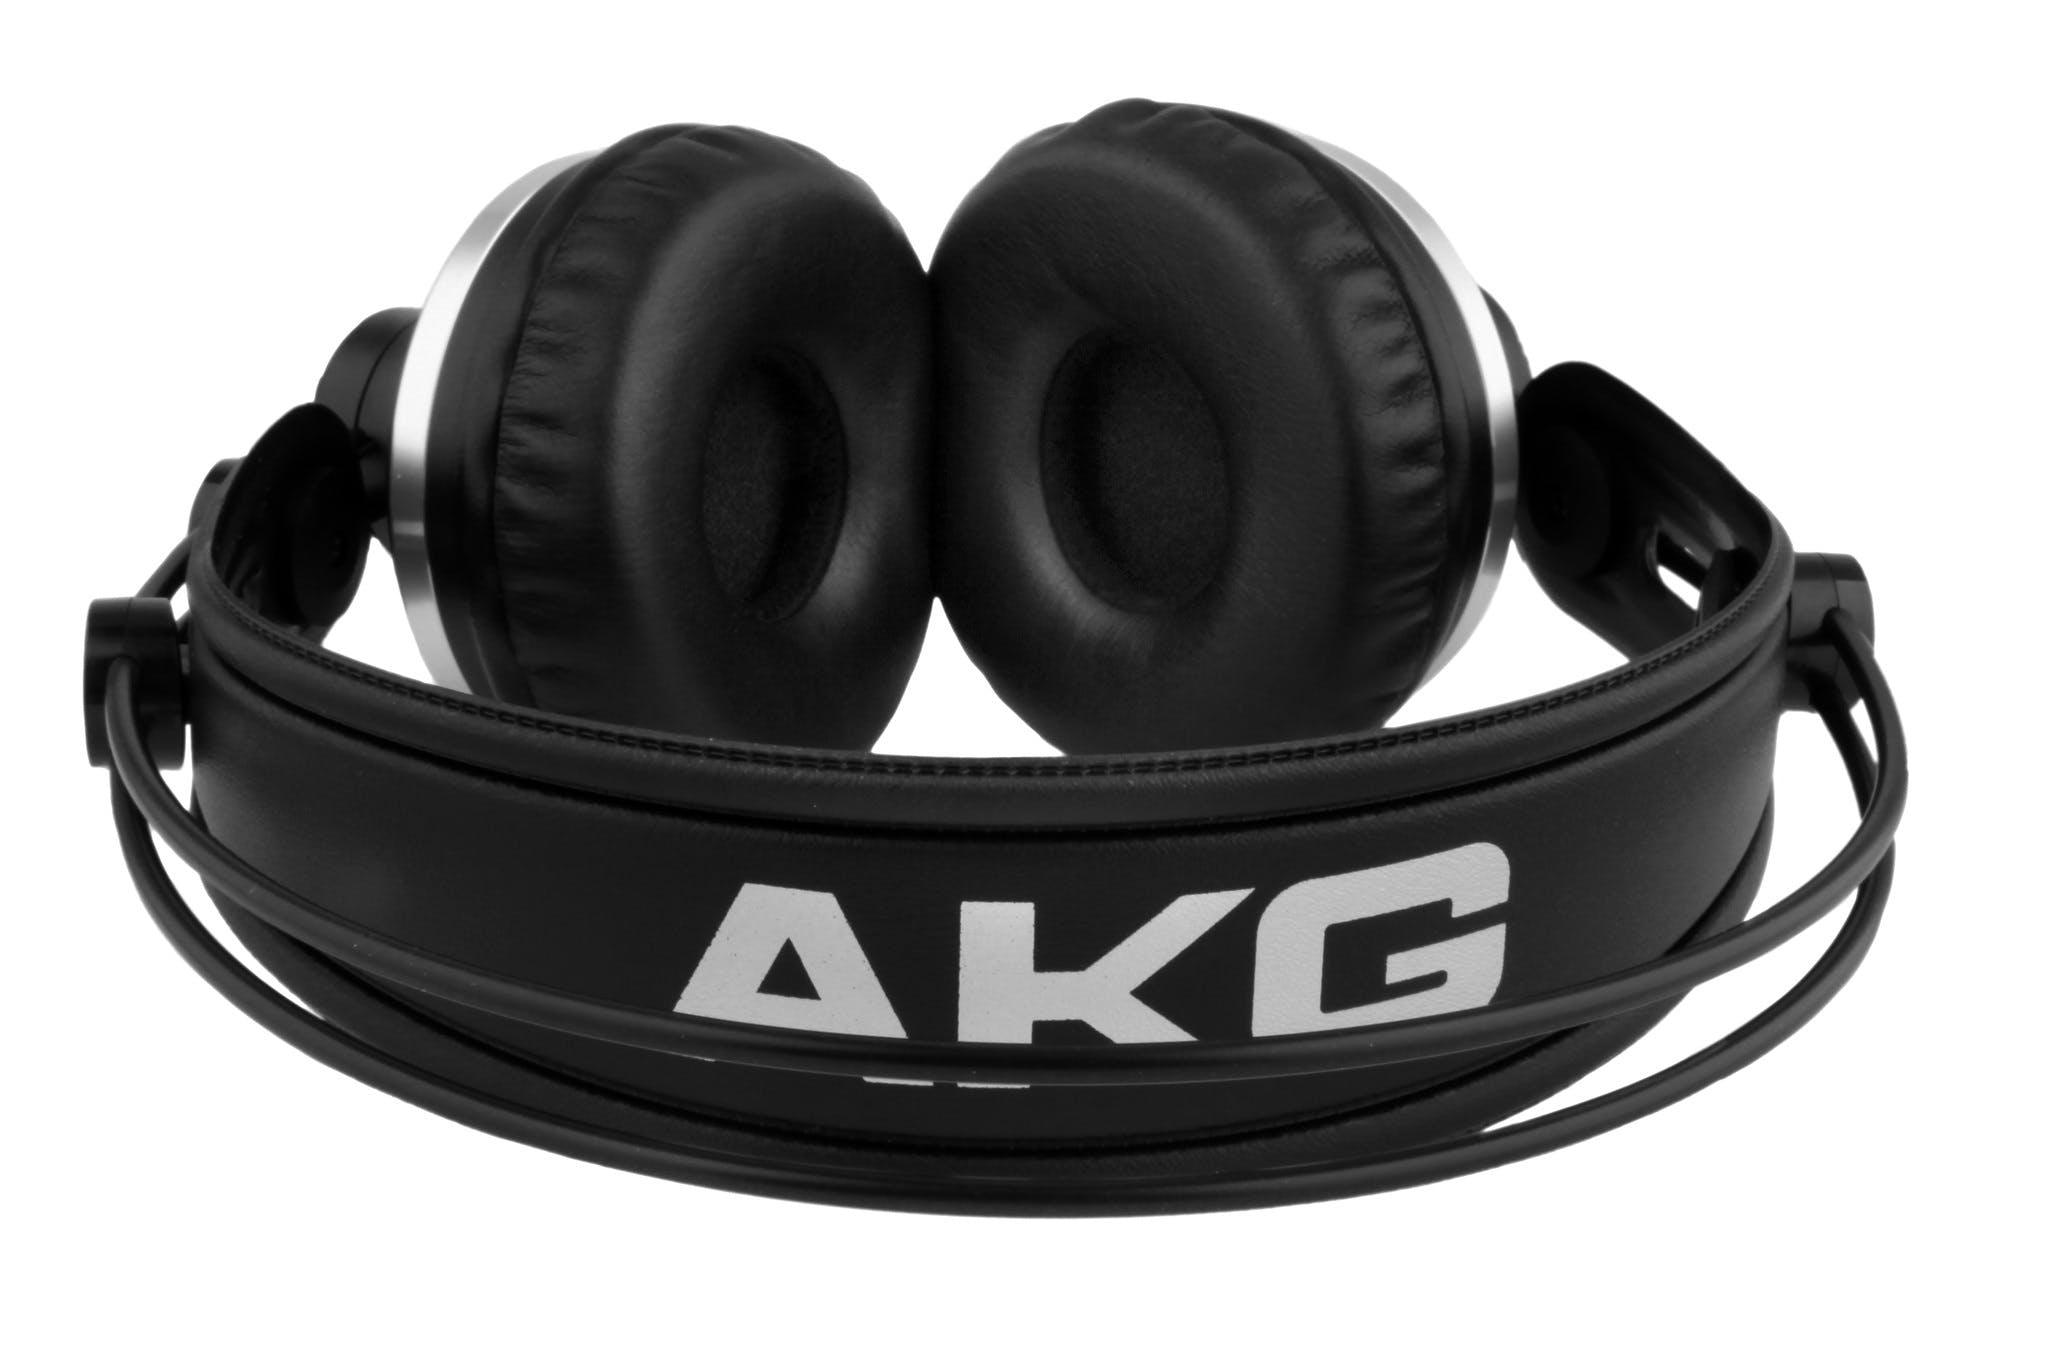 474cb13e68f AKG K141 MkII Headphones - Andertons Music Co.